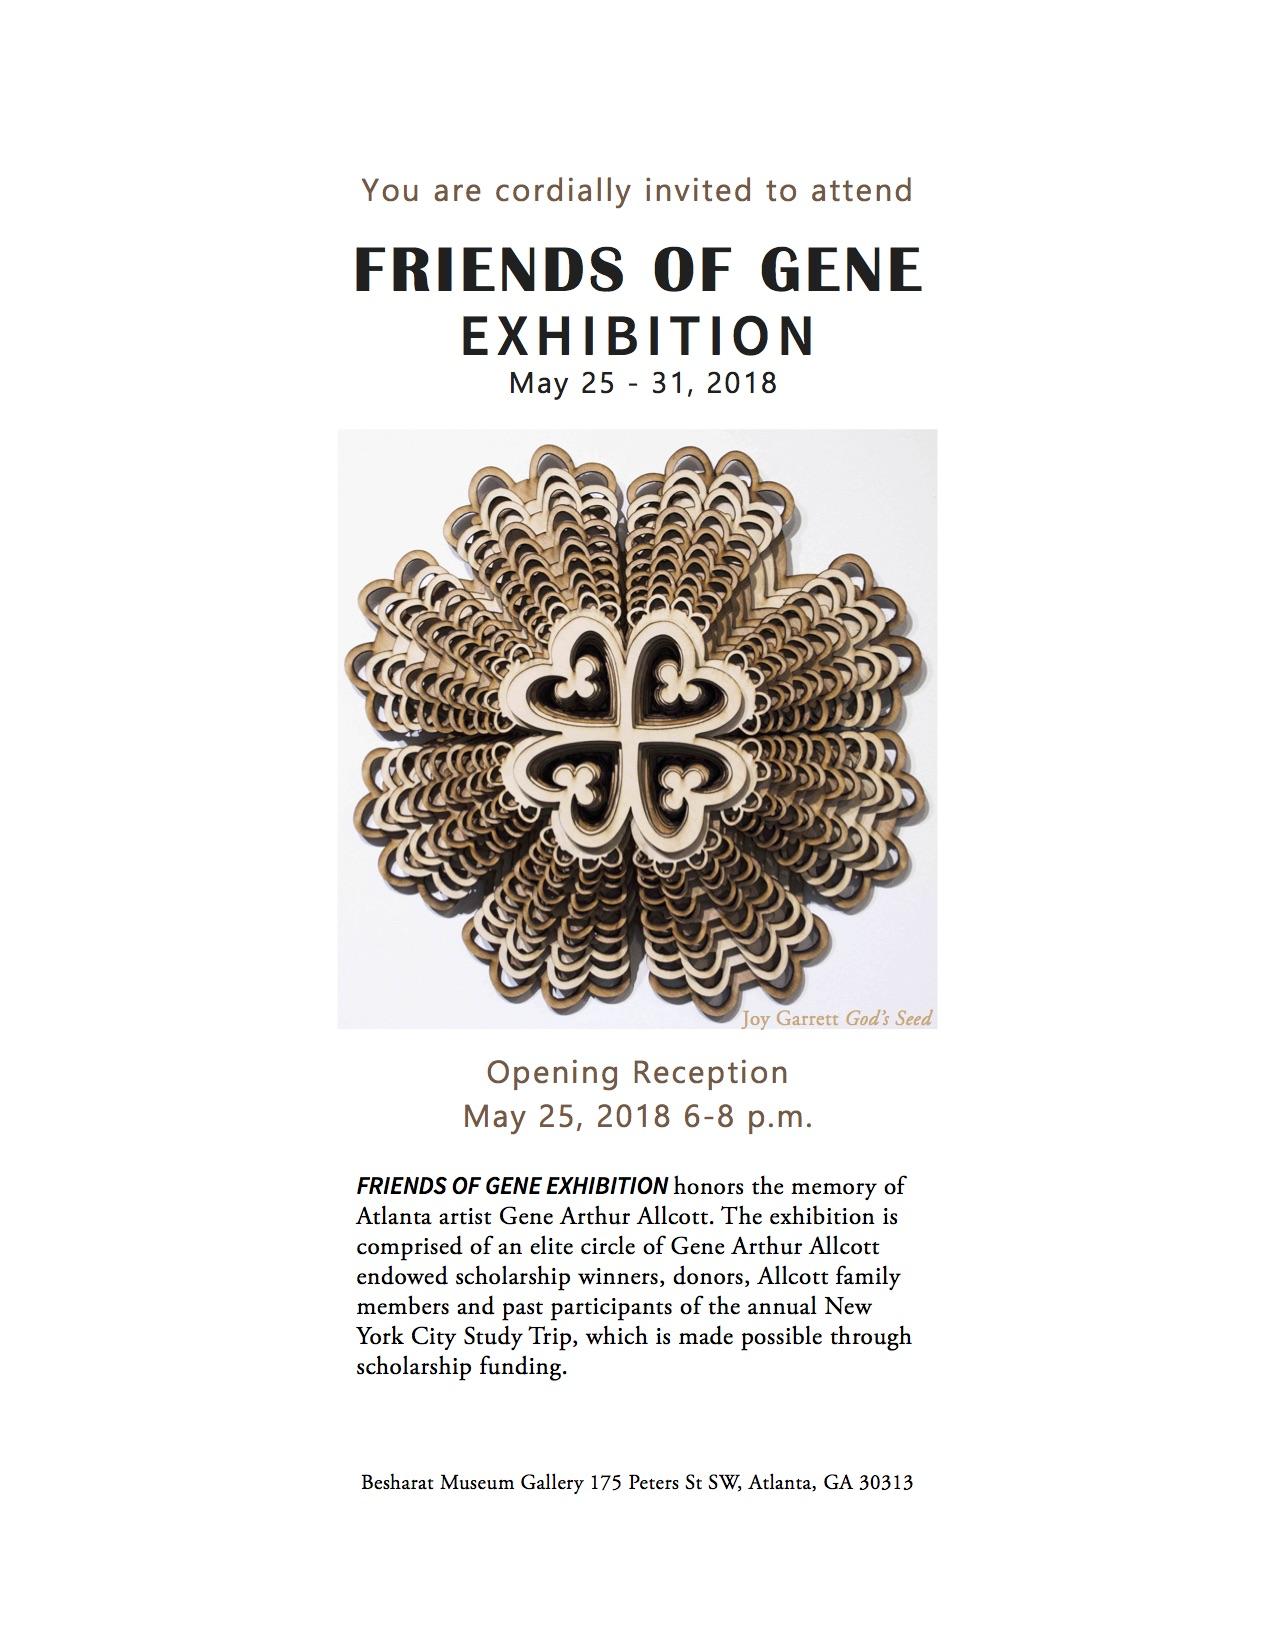 2018 FOG Exhibit Invitation, Joy Garrett's God Seed